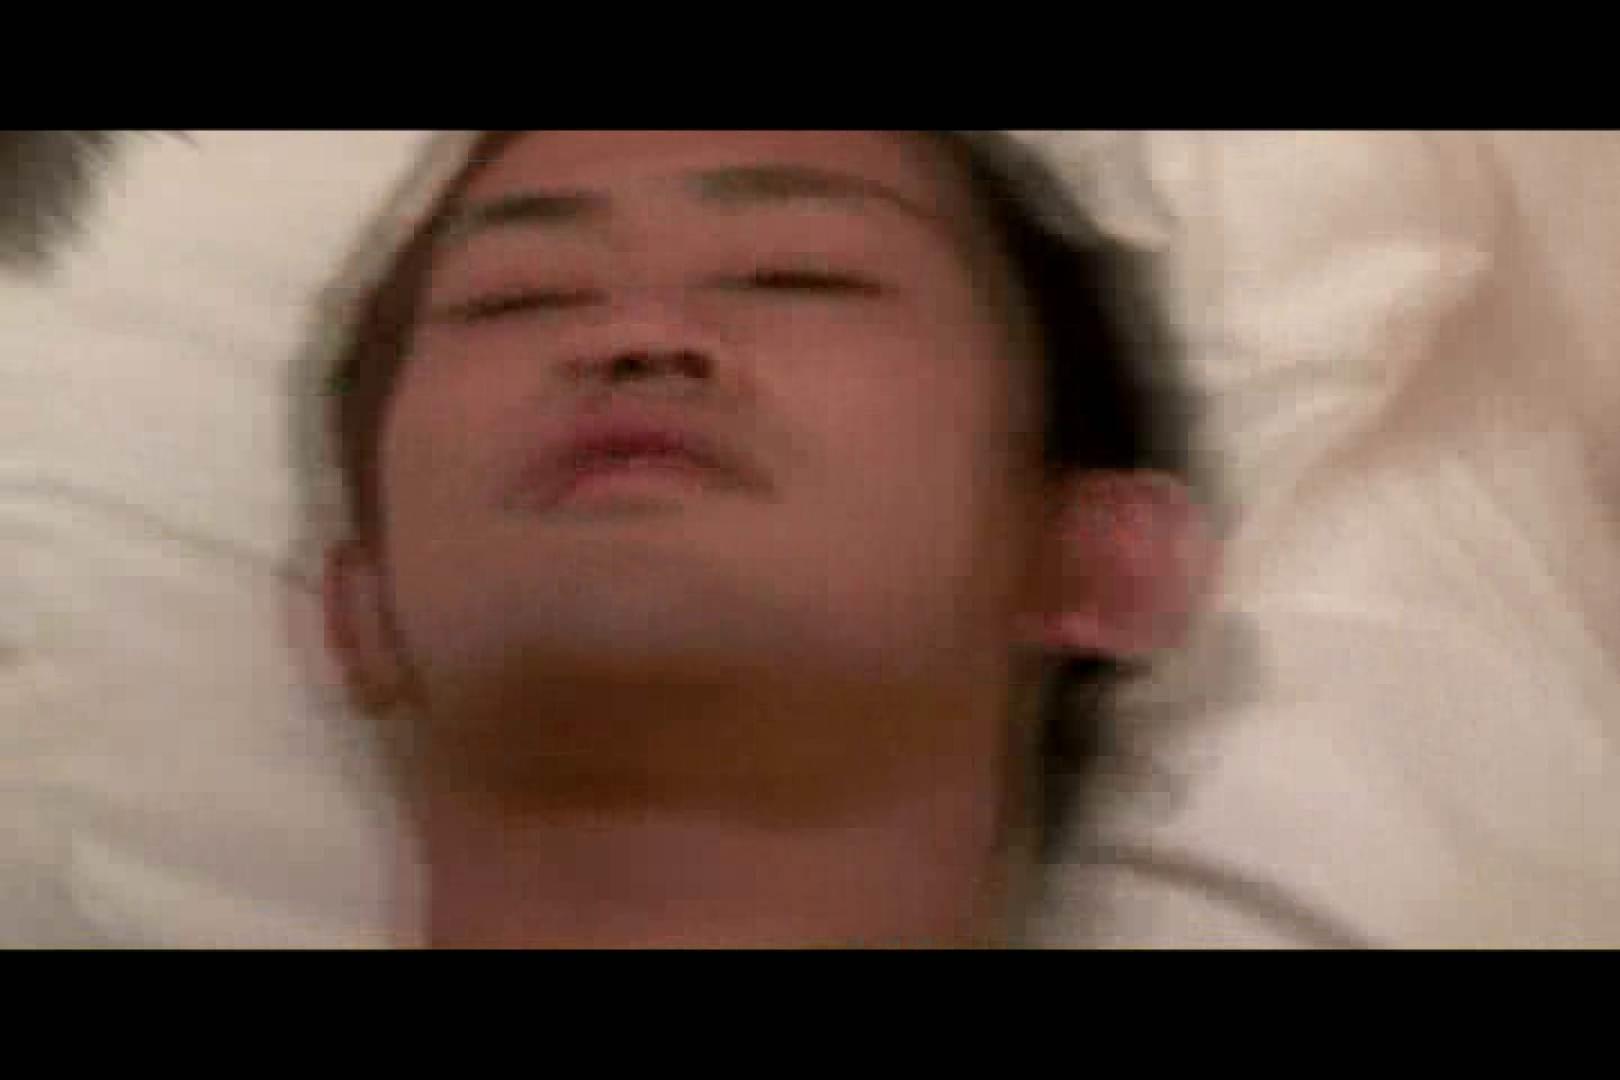 Bistro「イケメン」~Mokkori和風仕立て~vol.07 君のアナルは ゲイ精子画像 79画像 12